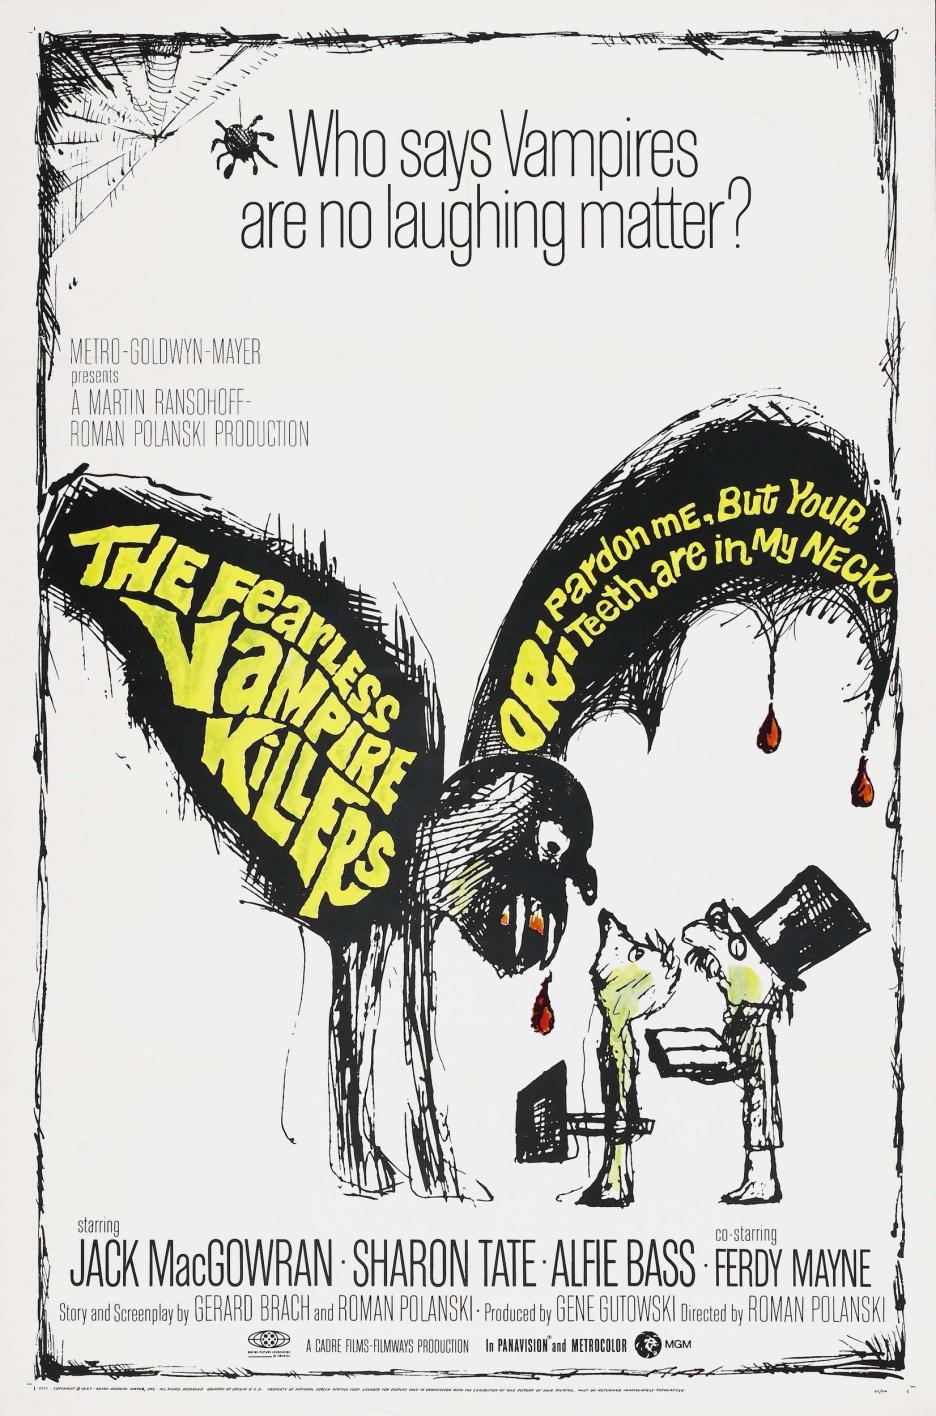 http://2.bp.blogspot.com/-MOYSgs914Nc/UJxg5AeWPlI/AAAAAAAAAlU/PdVGb9zsrnA/s1600/936full-the-fearless-vampire-killers-poster.jpg